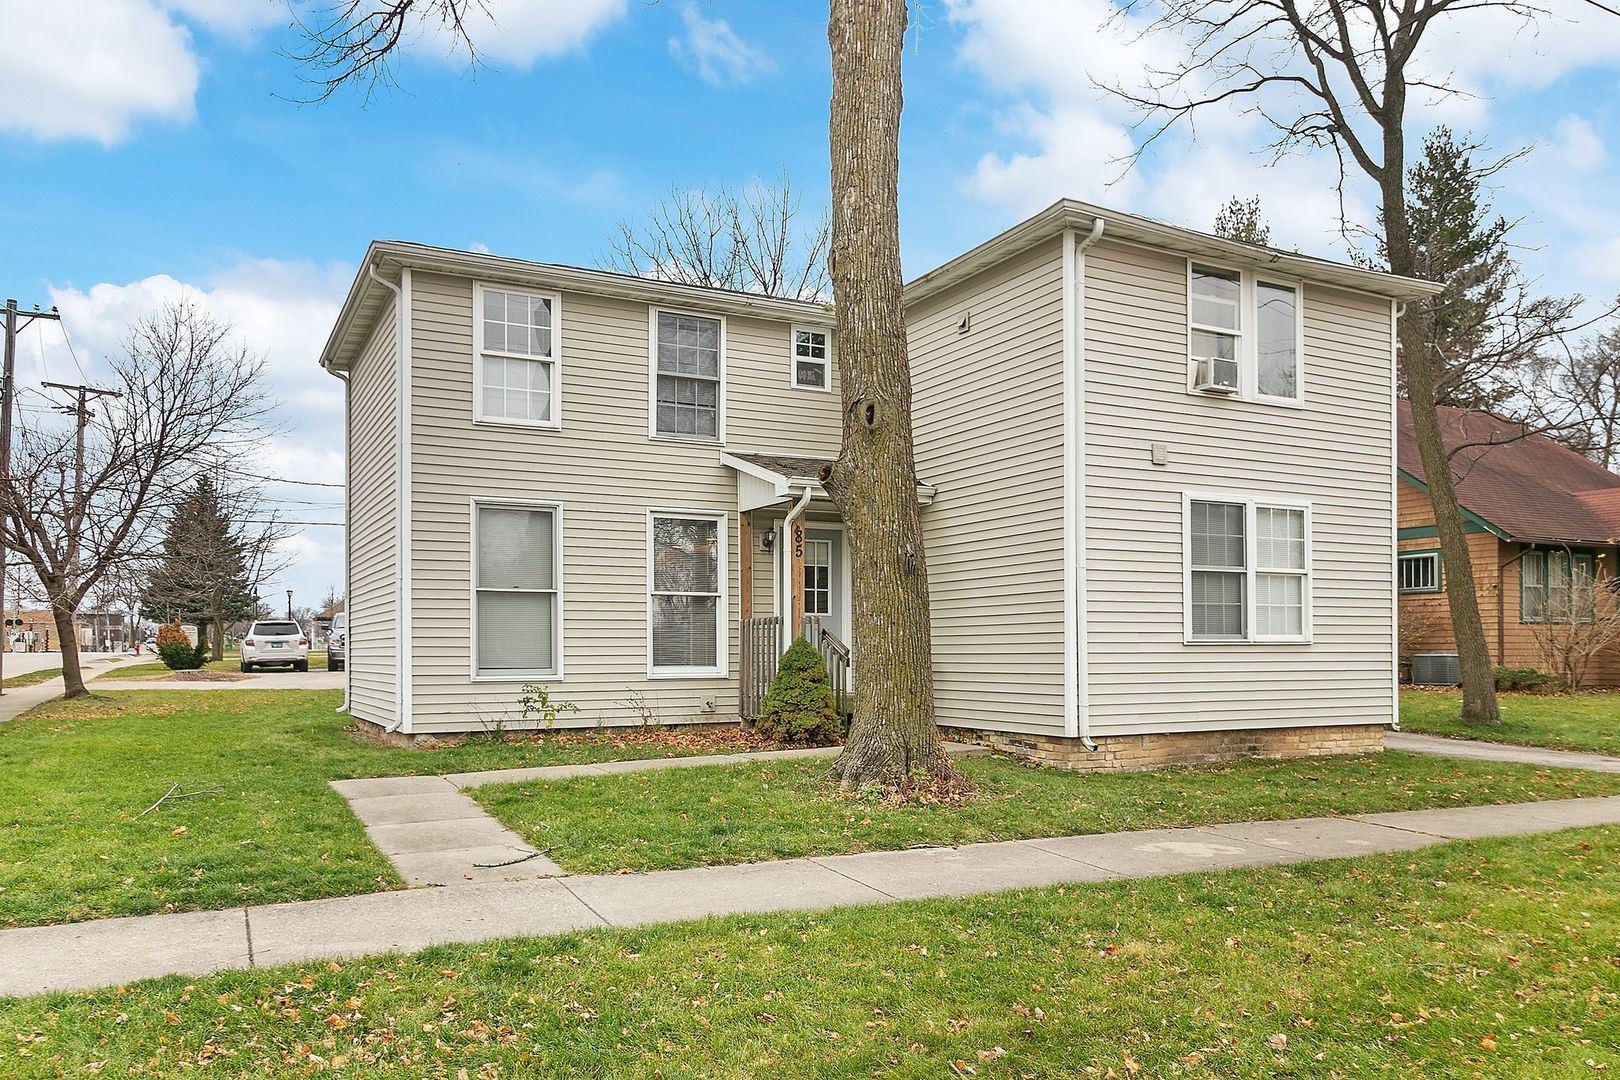 85 Gates Street, Crystal Lake, IL 60014 - #: 10943418